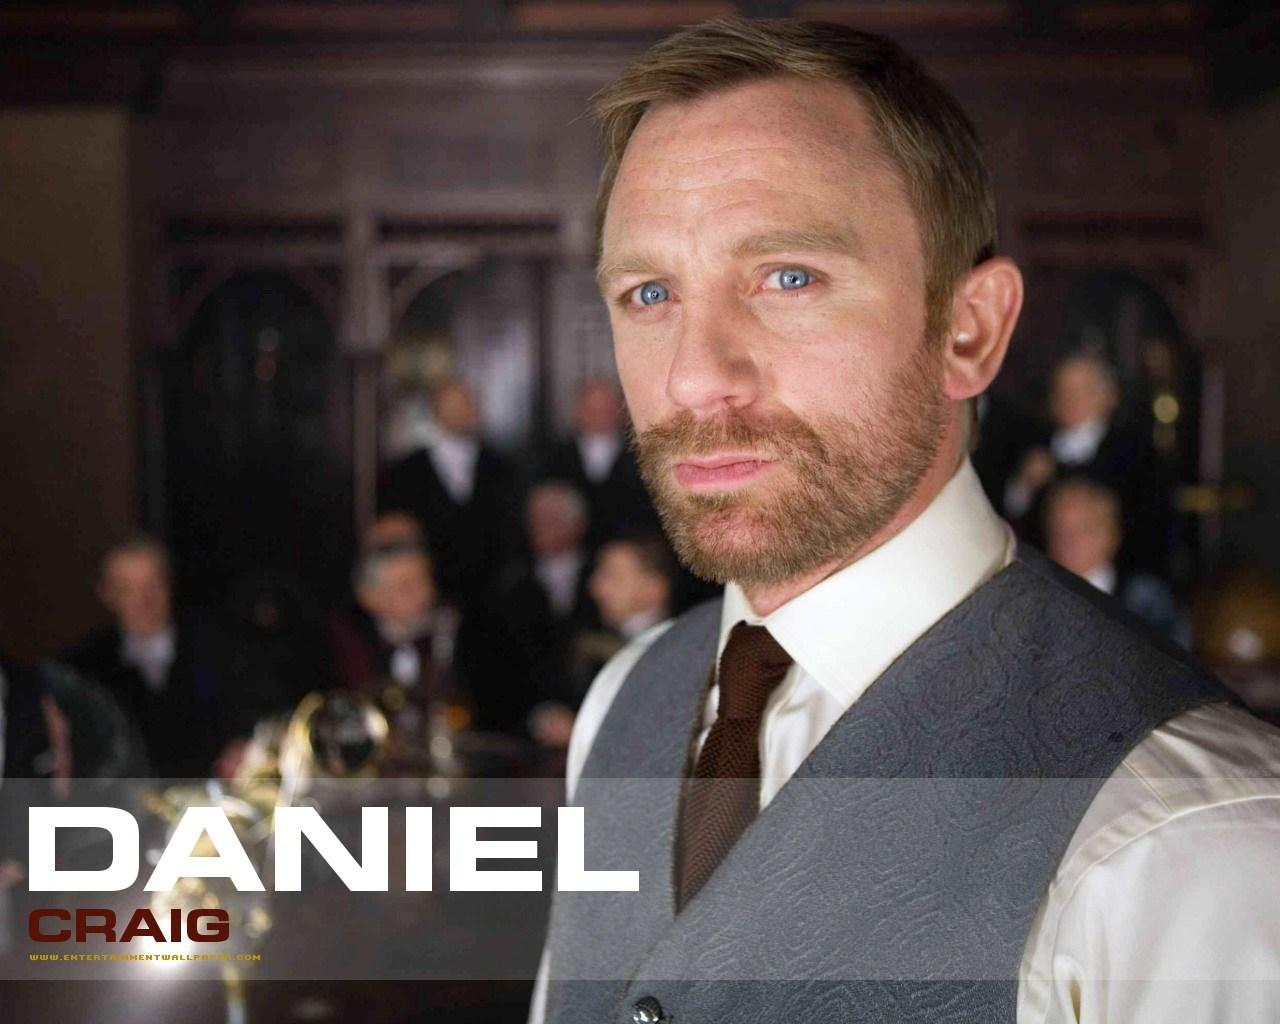 Daniel Craig in Hotel Splendide